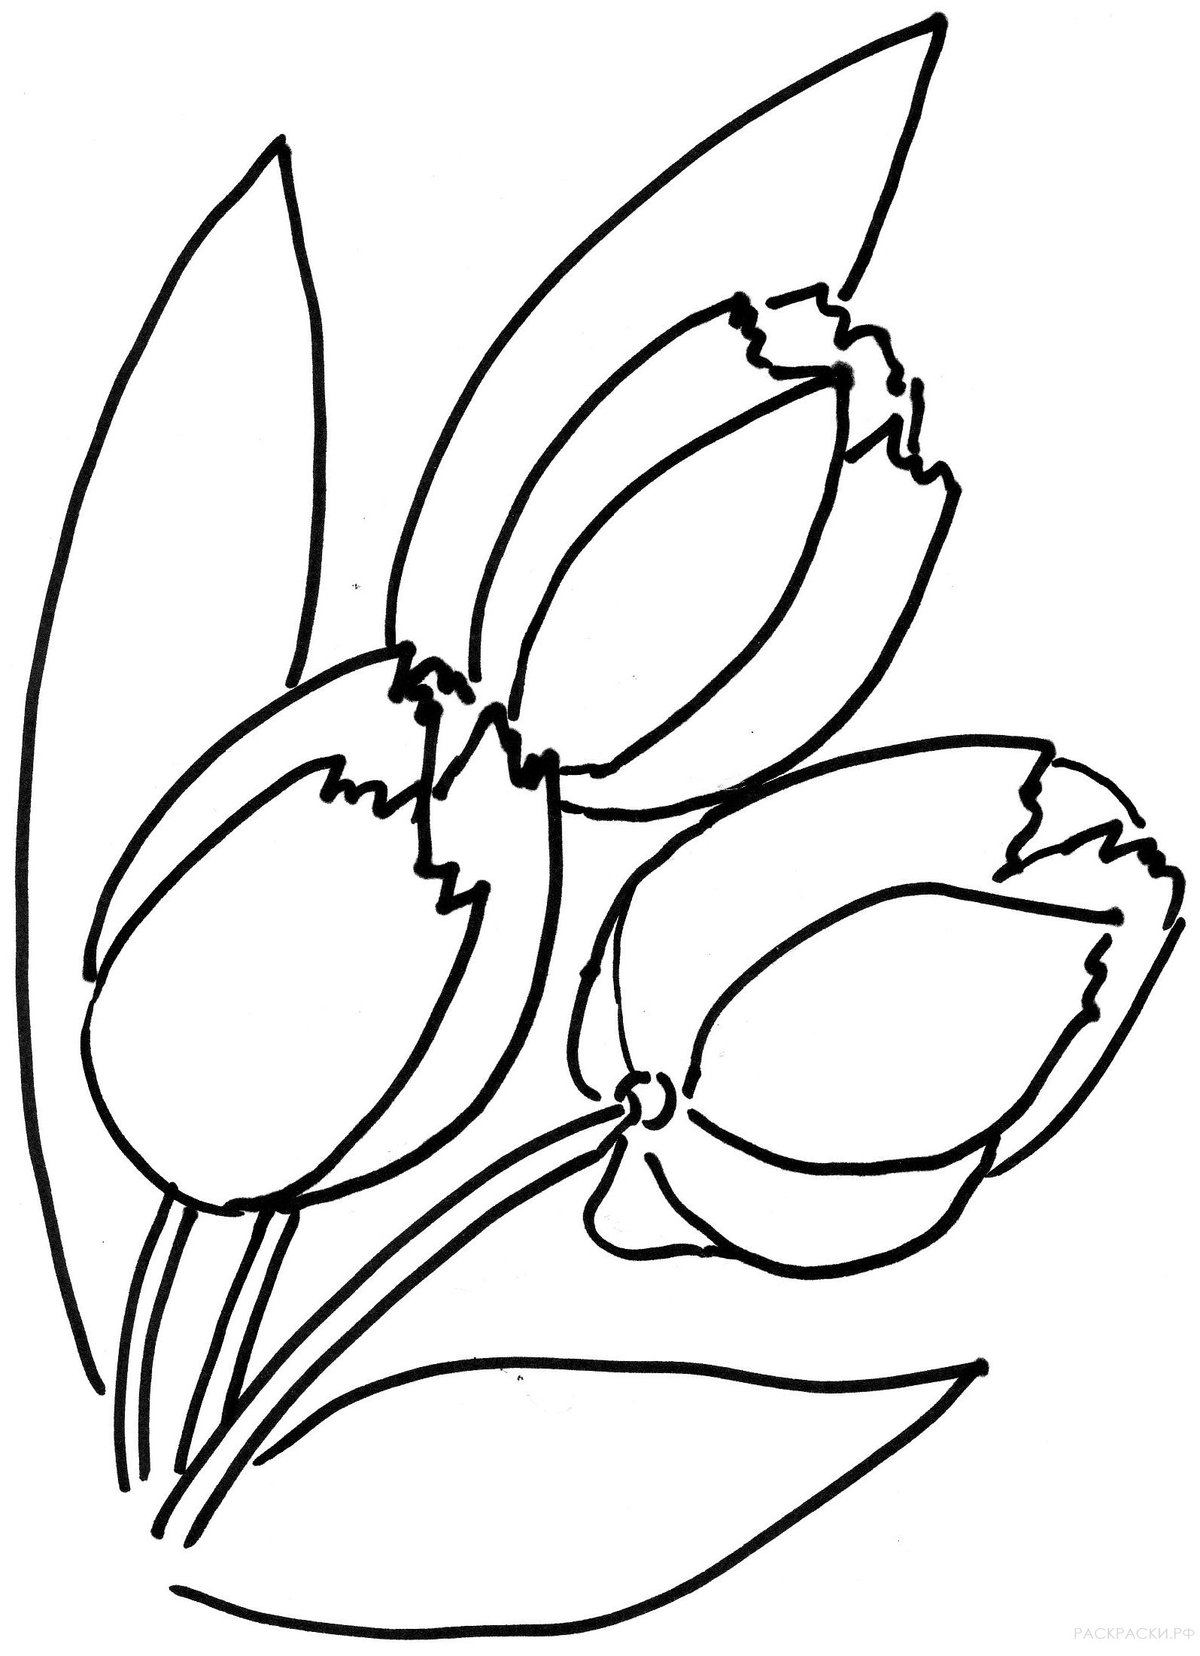 Картинки тюльпаны шаблоны